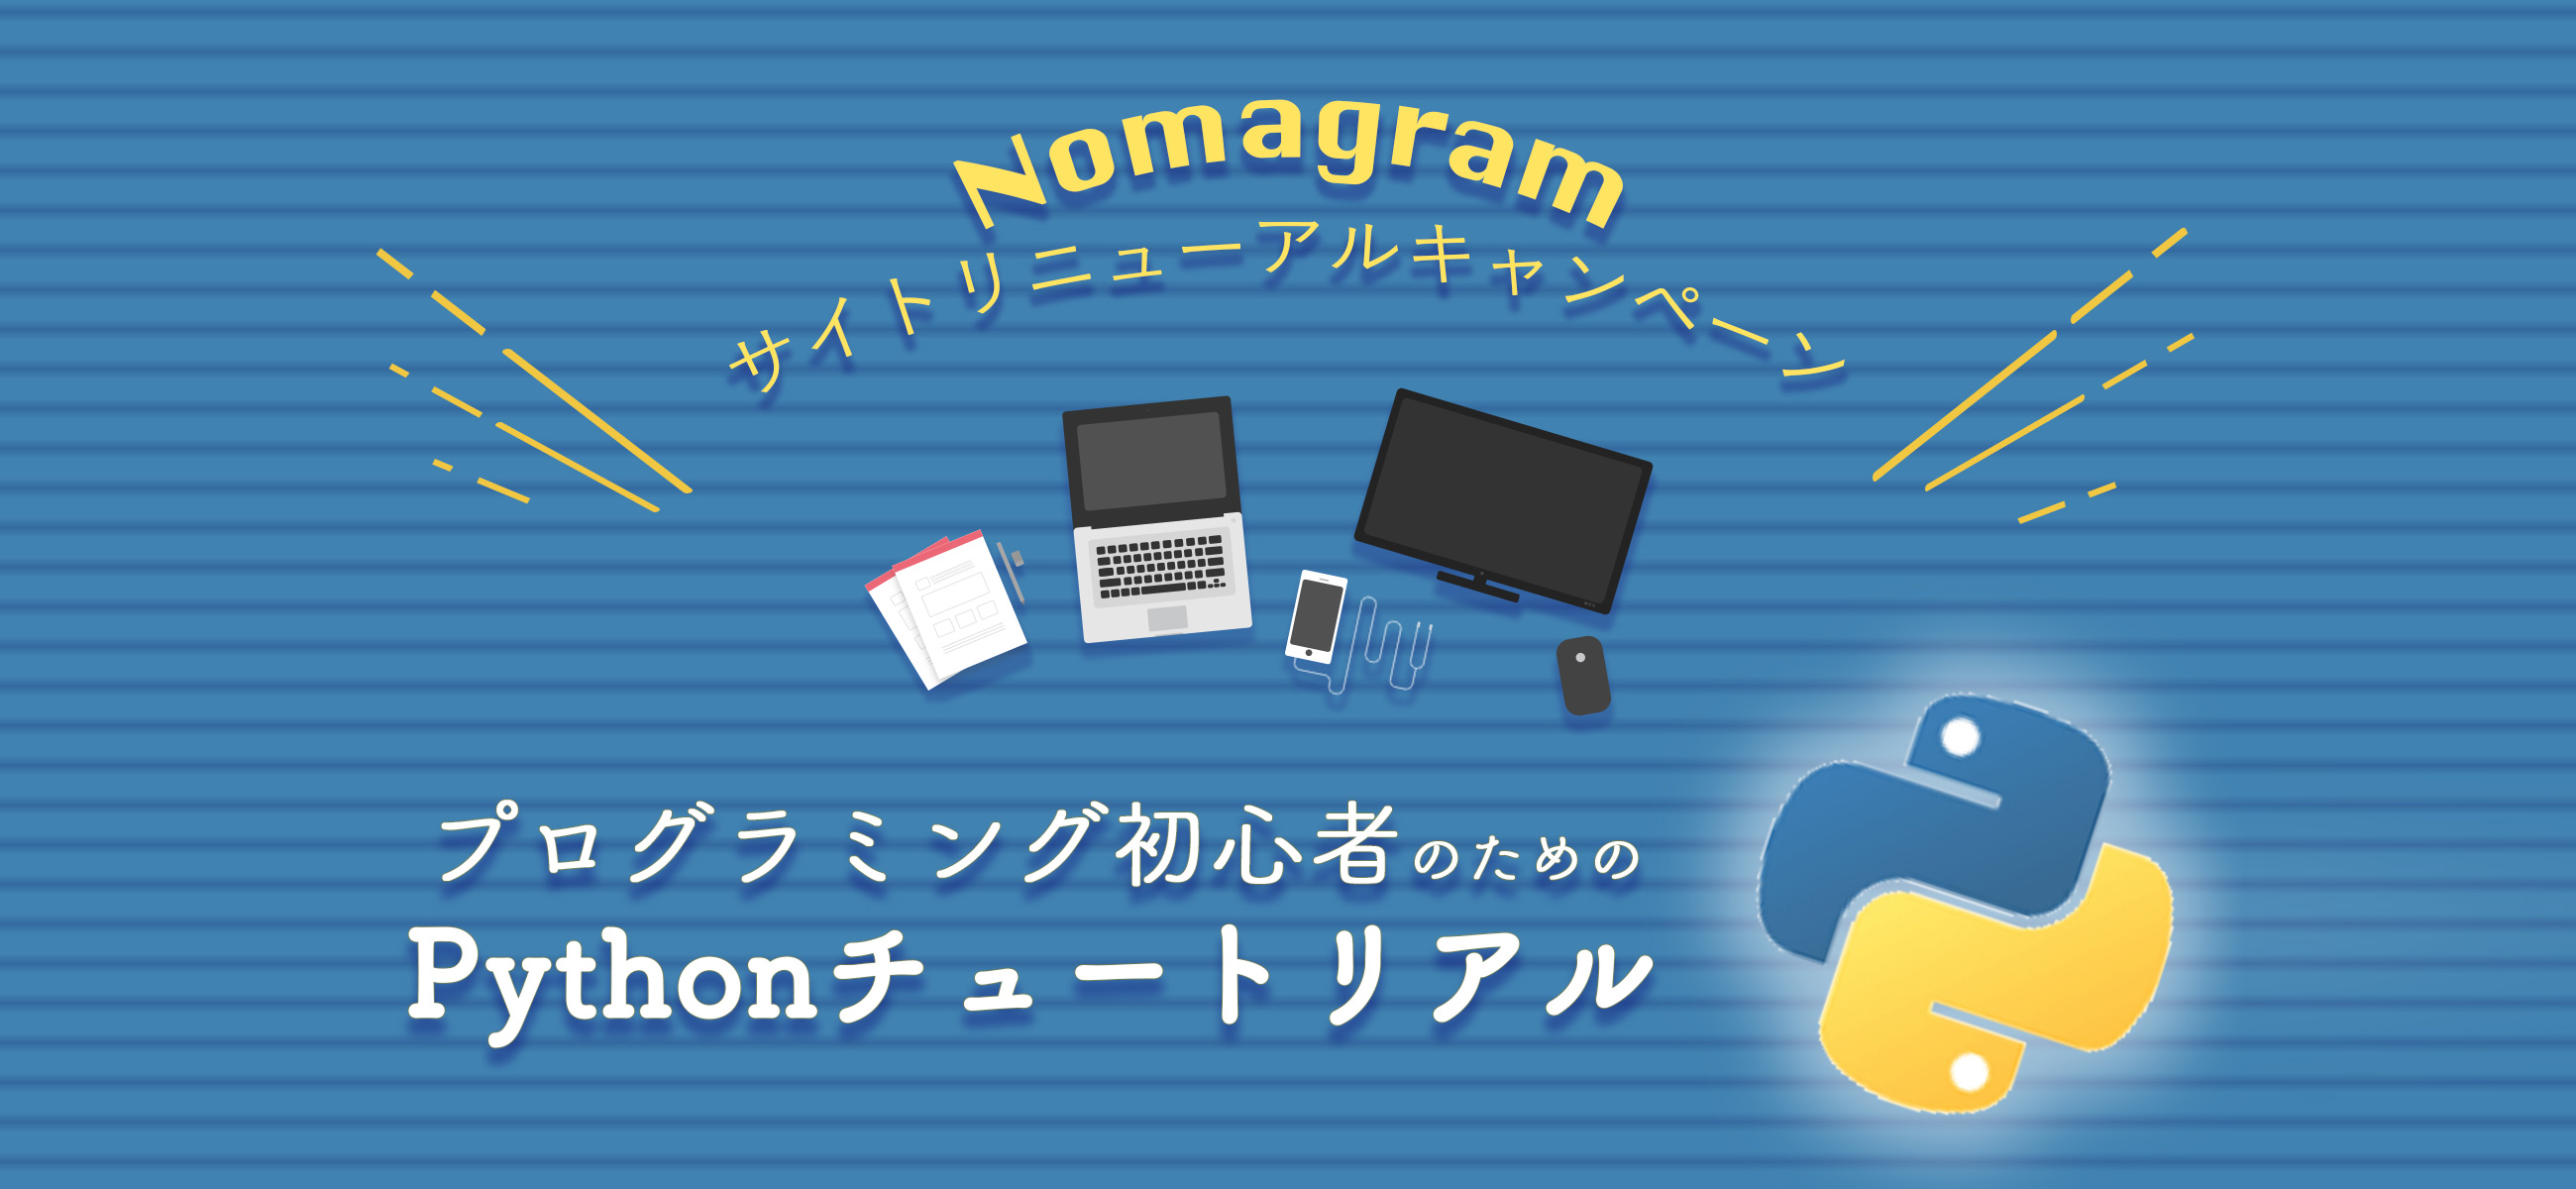 nomagram - AIビジネスの最前線